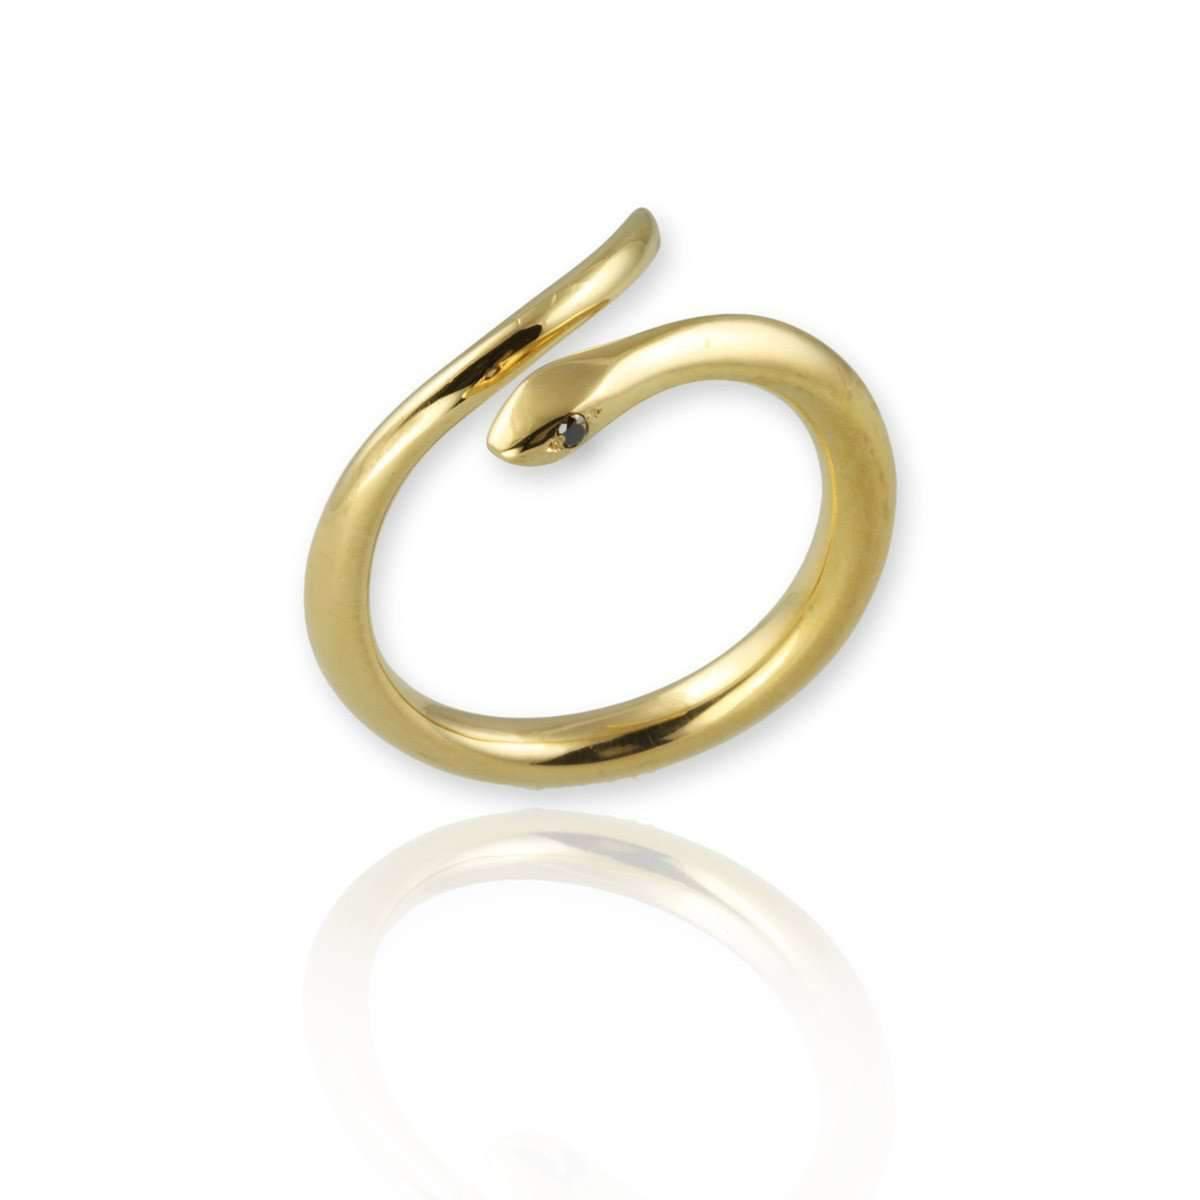 Jana Reinhardt Gold Plated Silver Snake Necklace With Black Diamonds oYohPLP